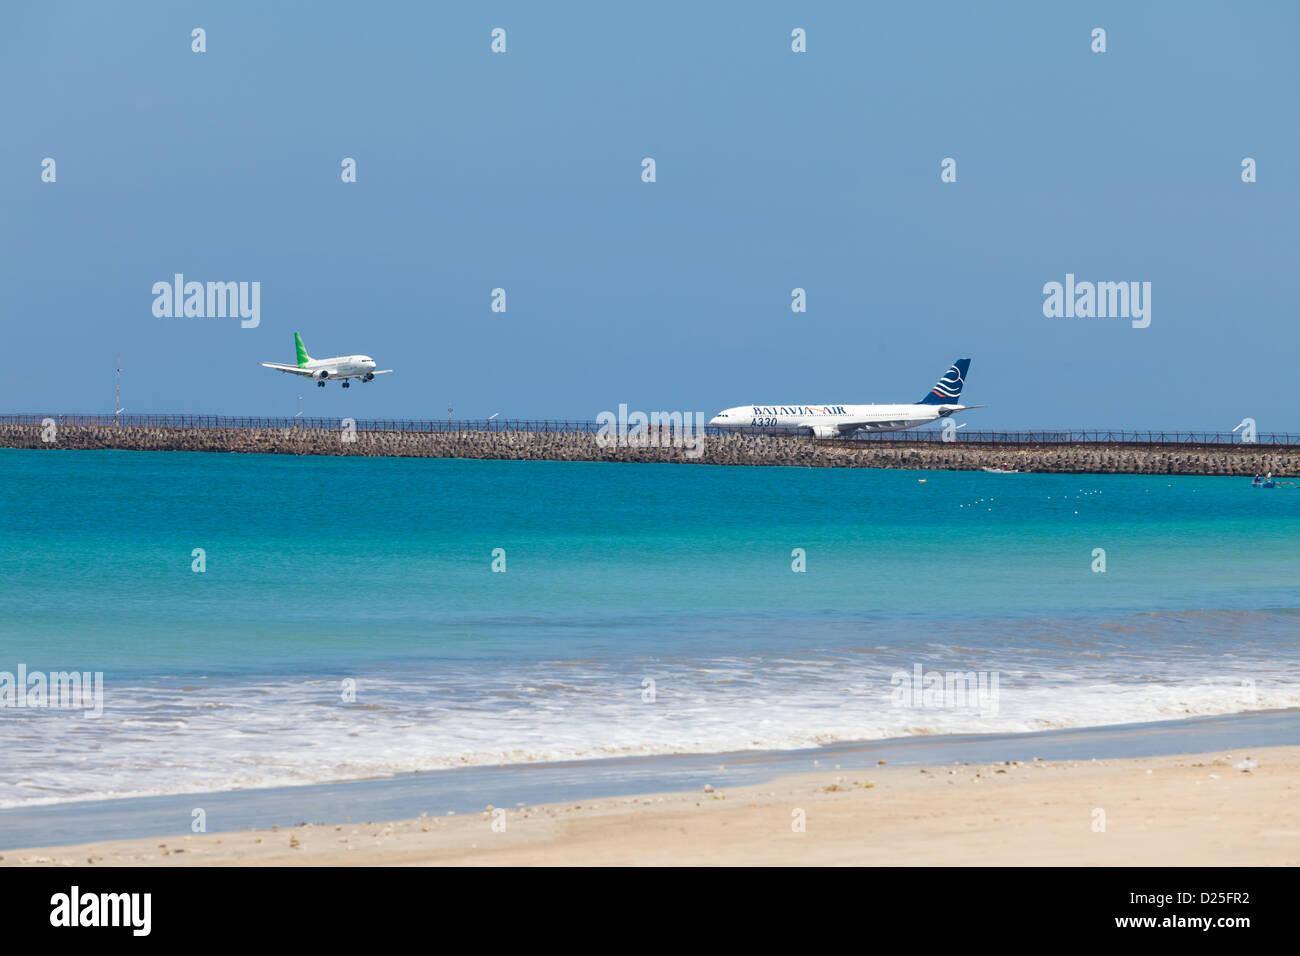 Aeroporto Bali : Bali febbraio piani di sbarco aeroporto di jimbaran beach il